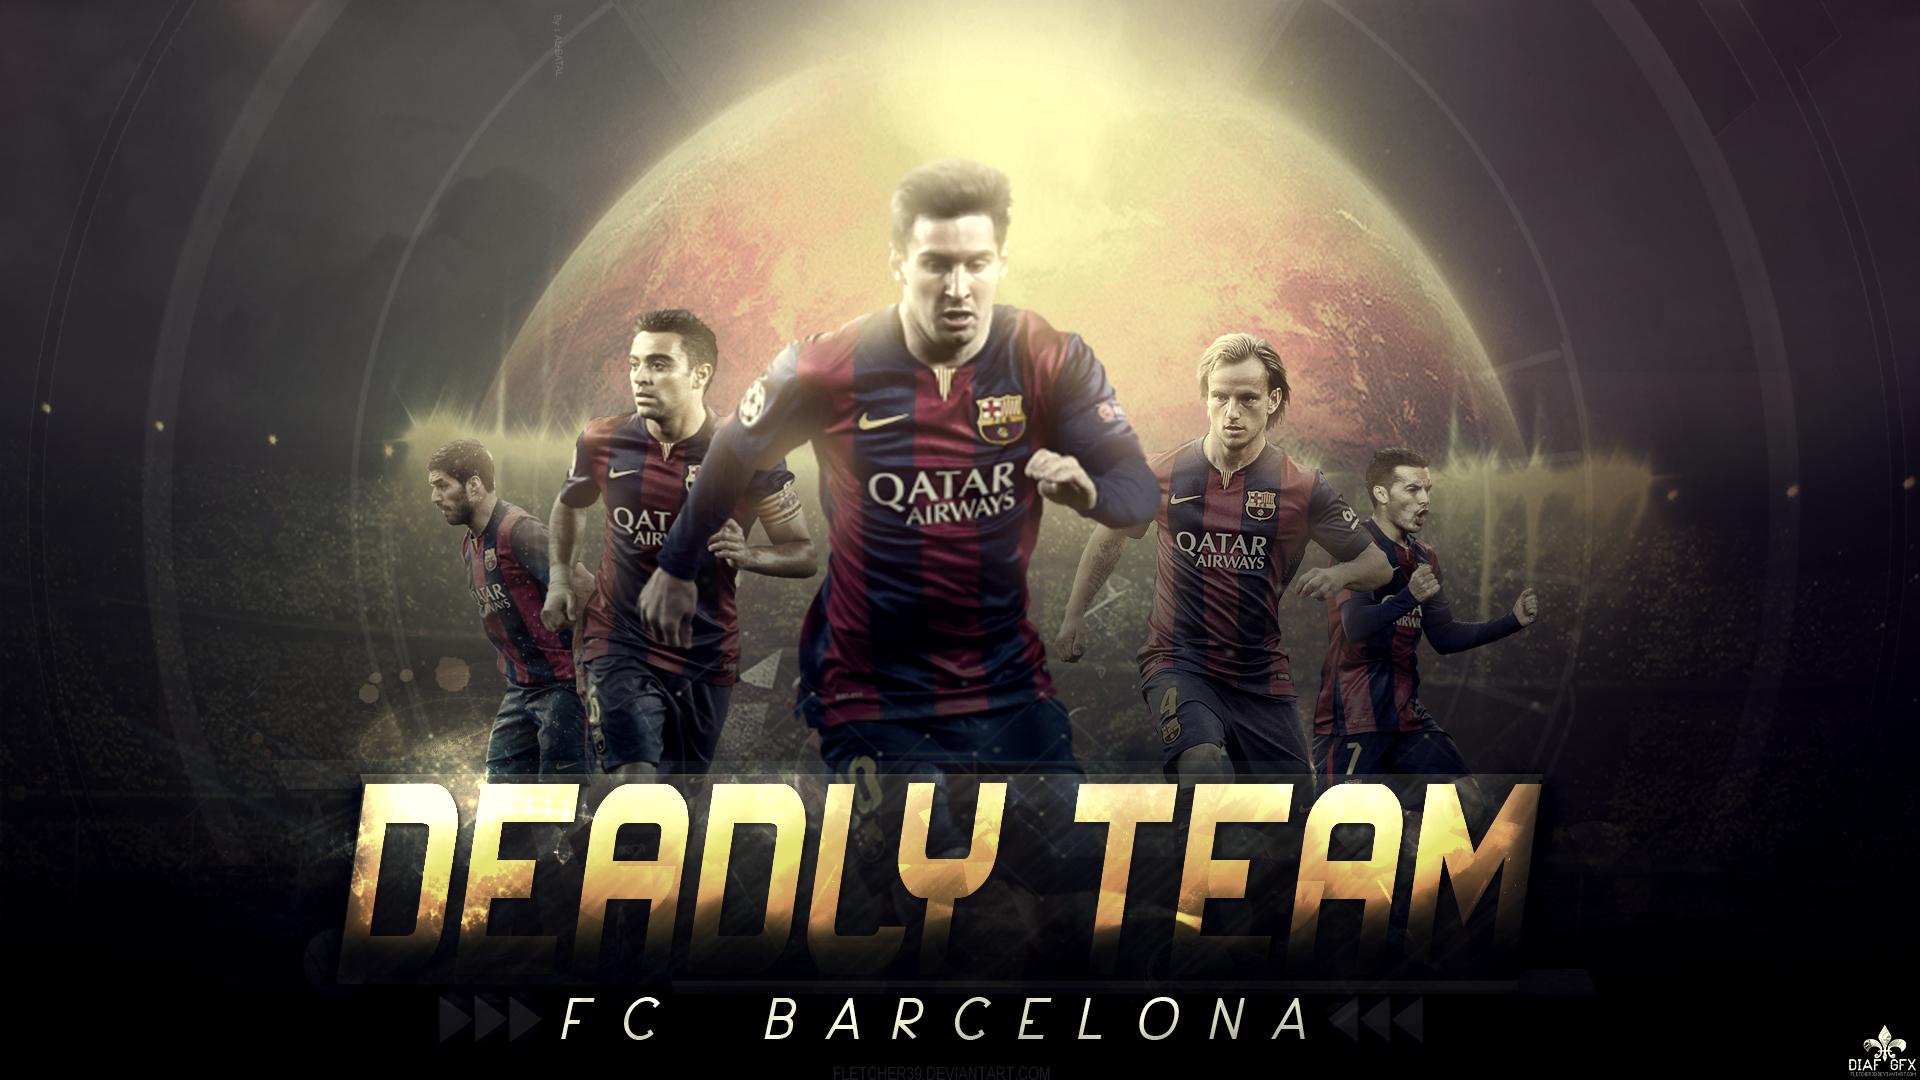 Fc Barcelona Wallpaper The Deadly Team by FLETCHER39 1920x1080